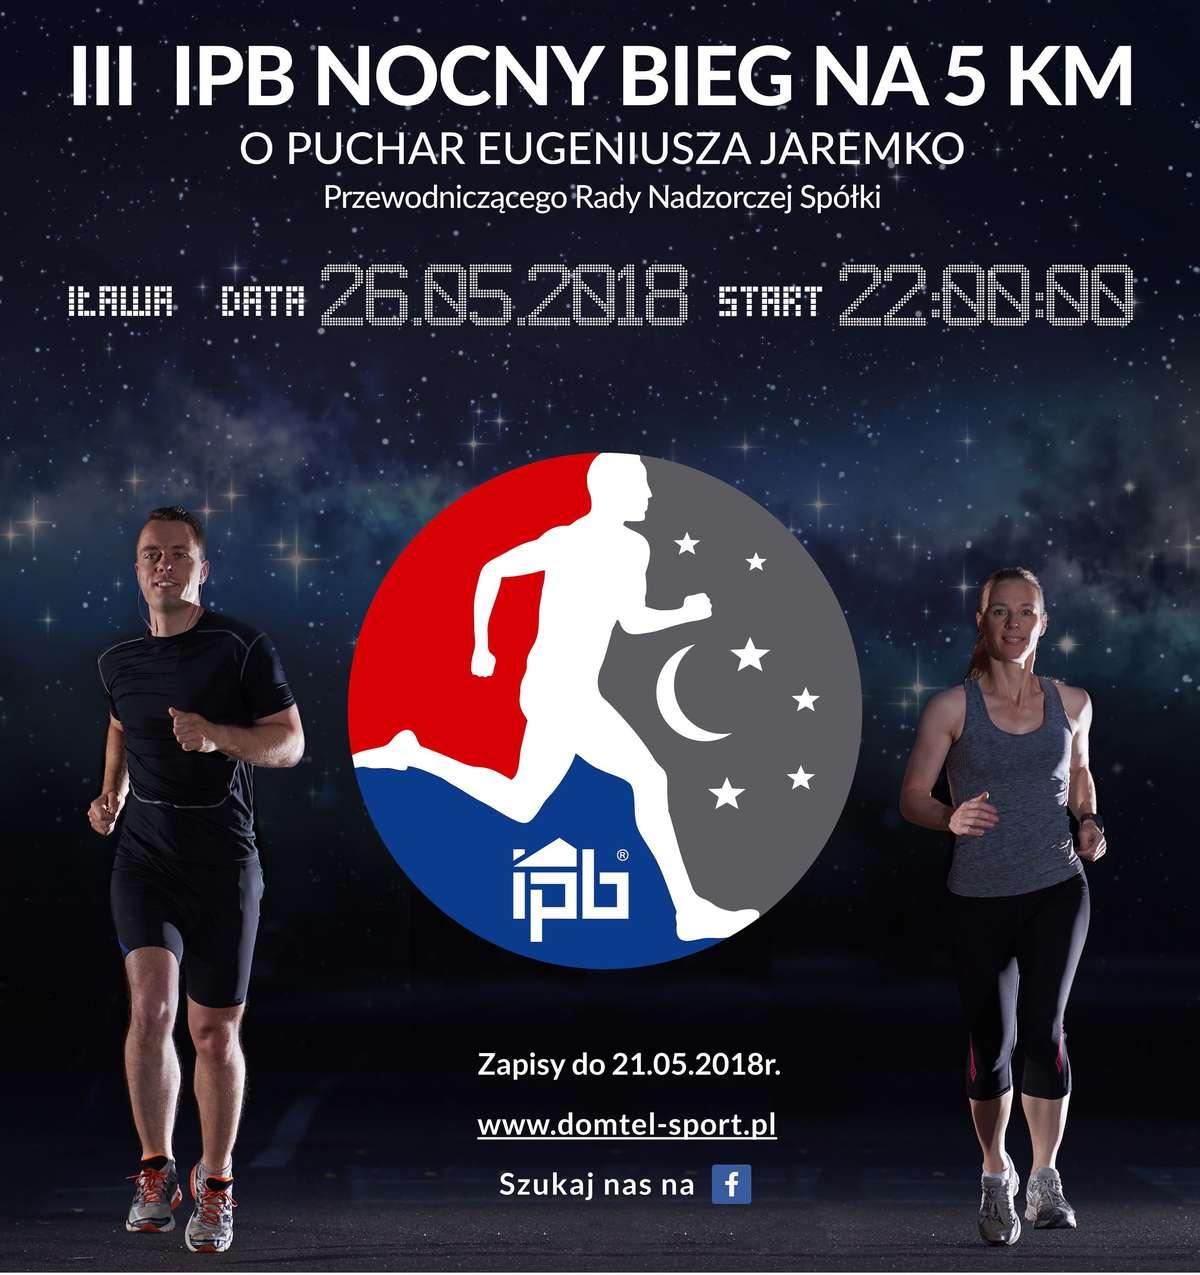 III IPB Nocny Bieg Na 5 km o Puchar Eugeniusza Jaremko - full image